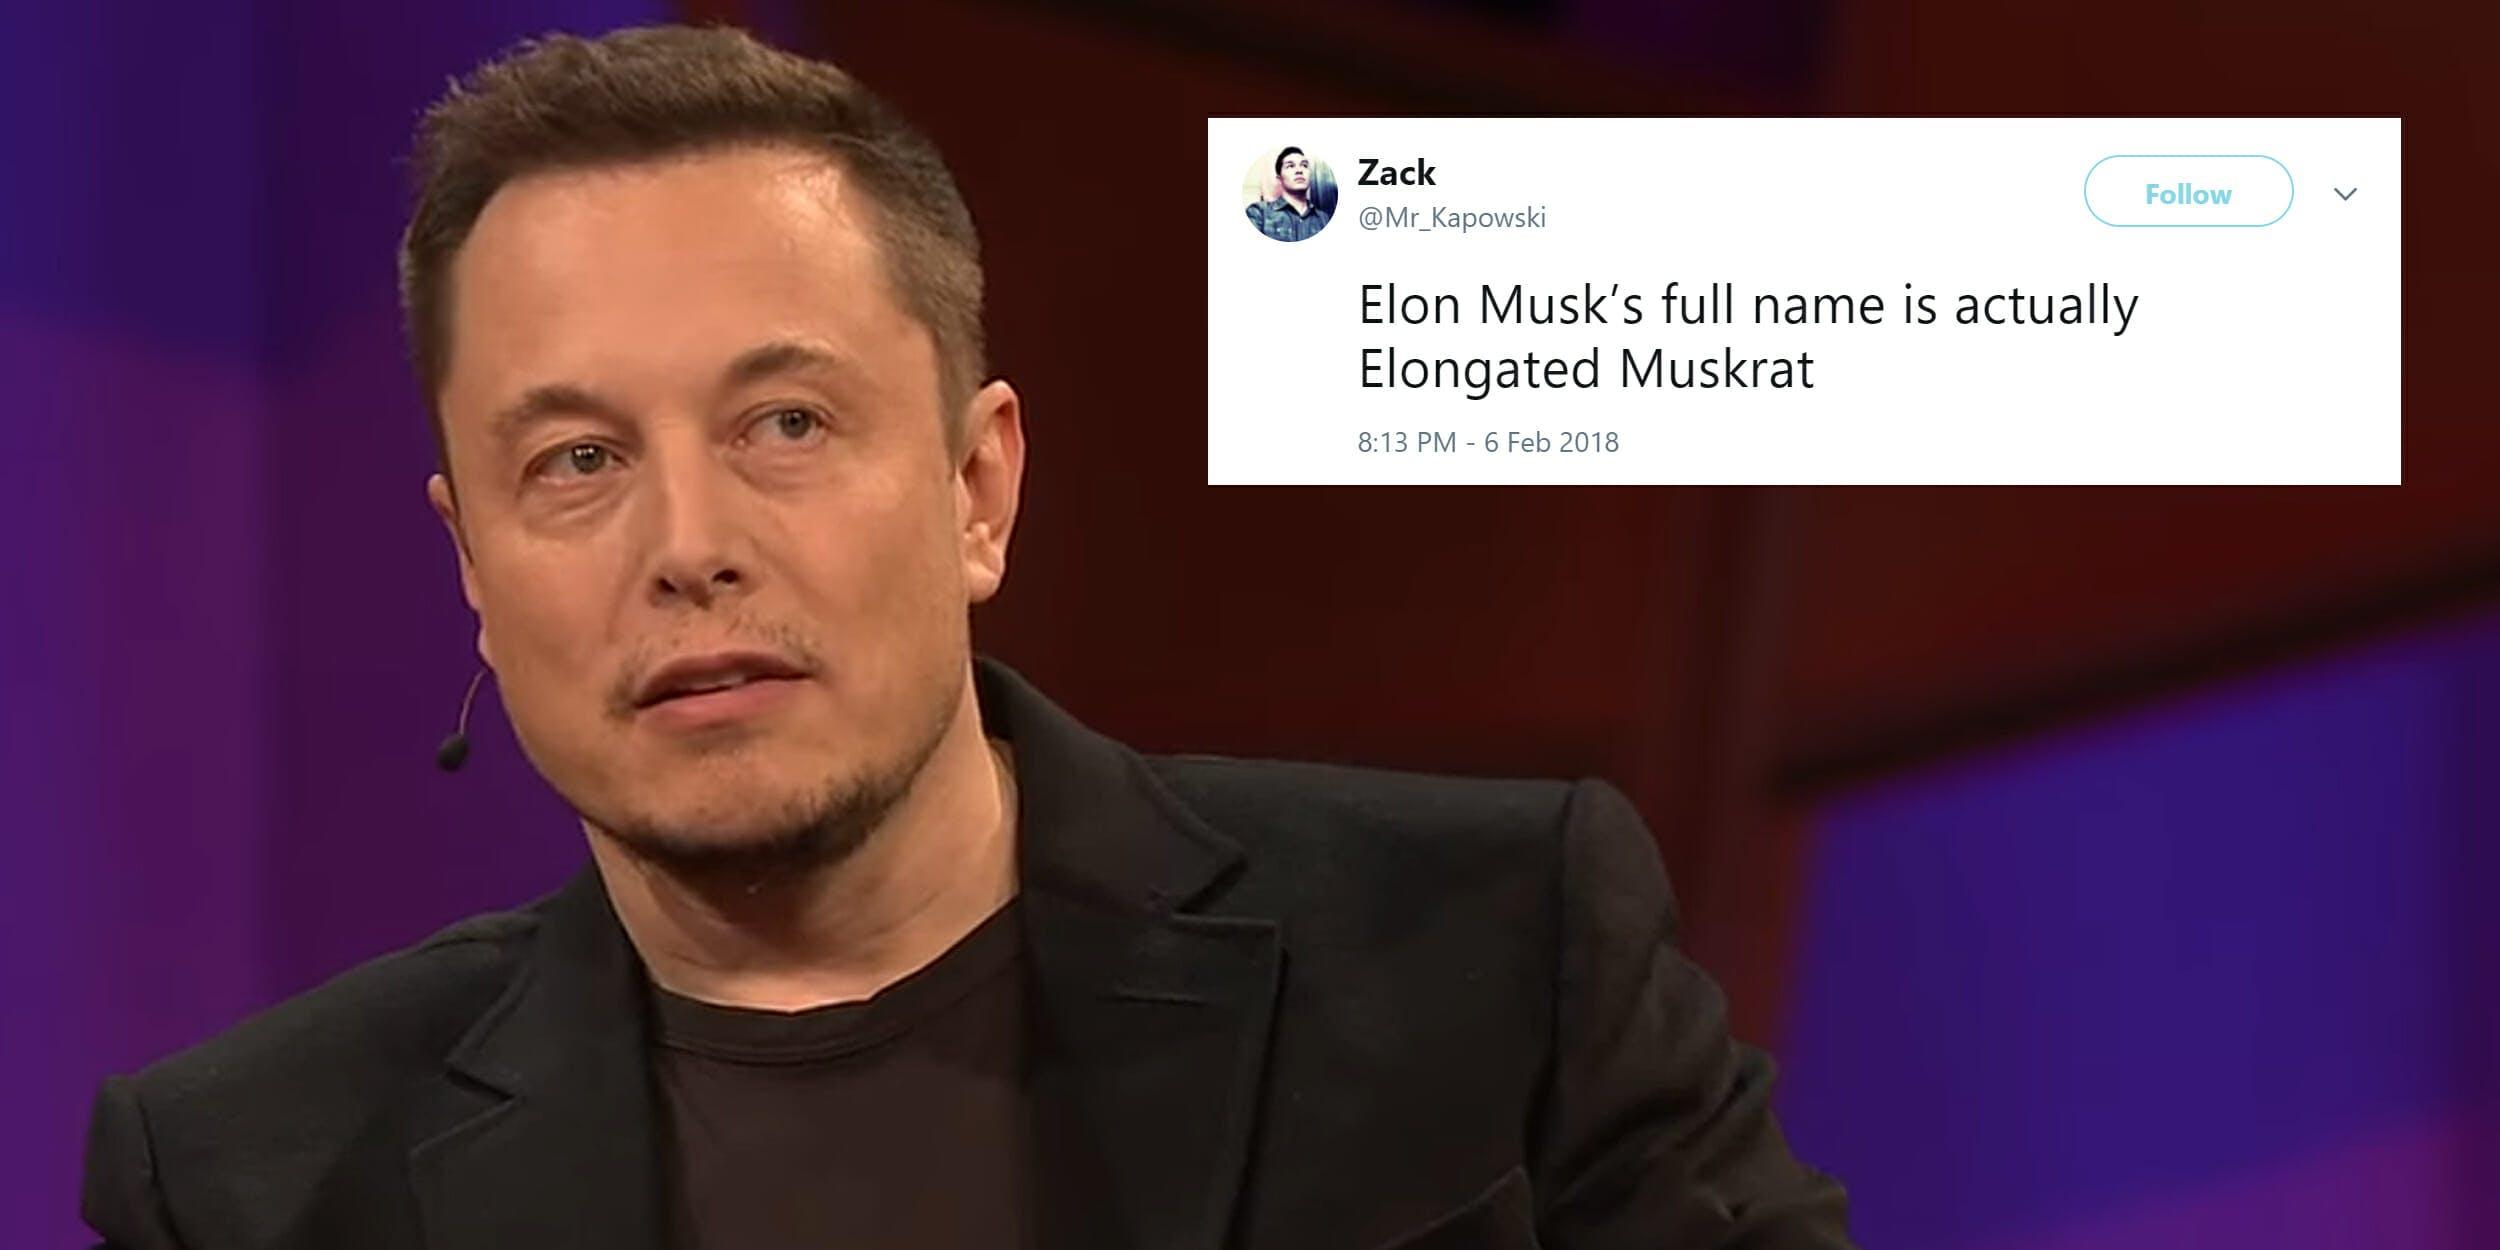 Elon Musk is actually named Elongated Muskrat meme